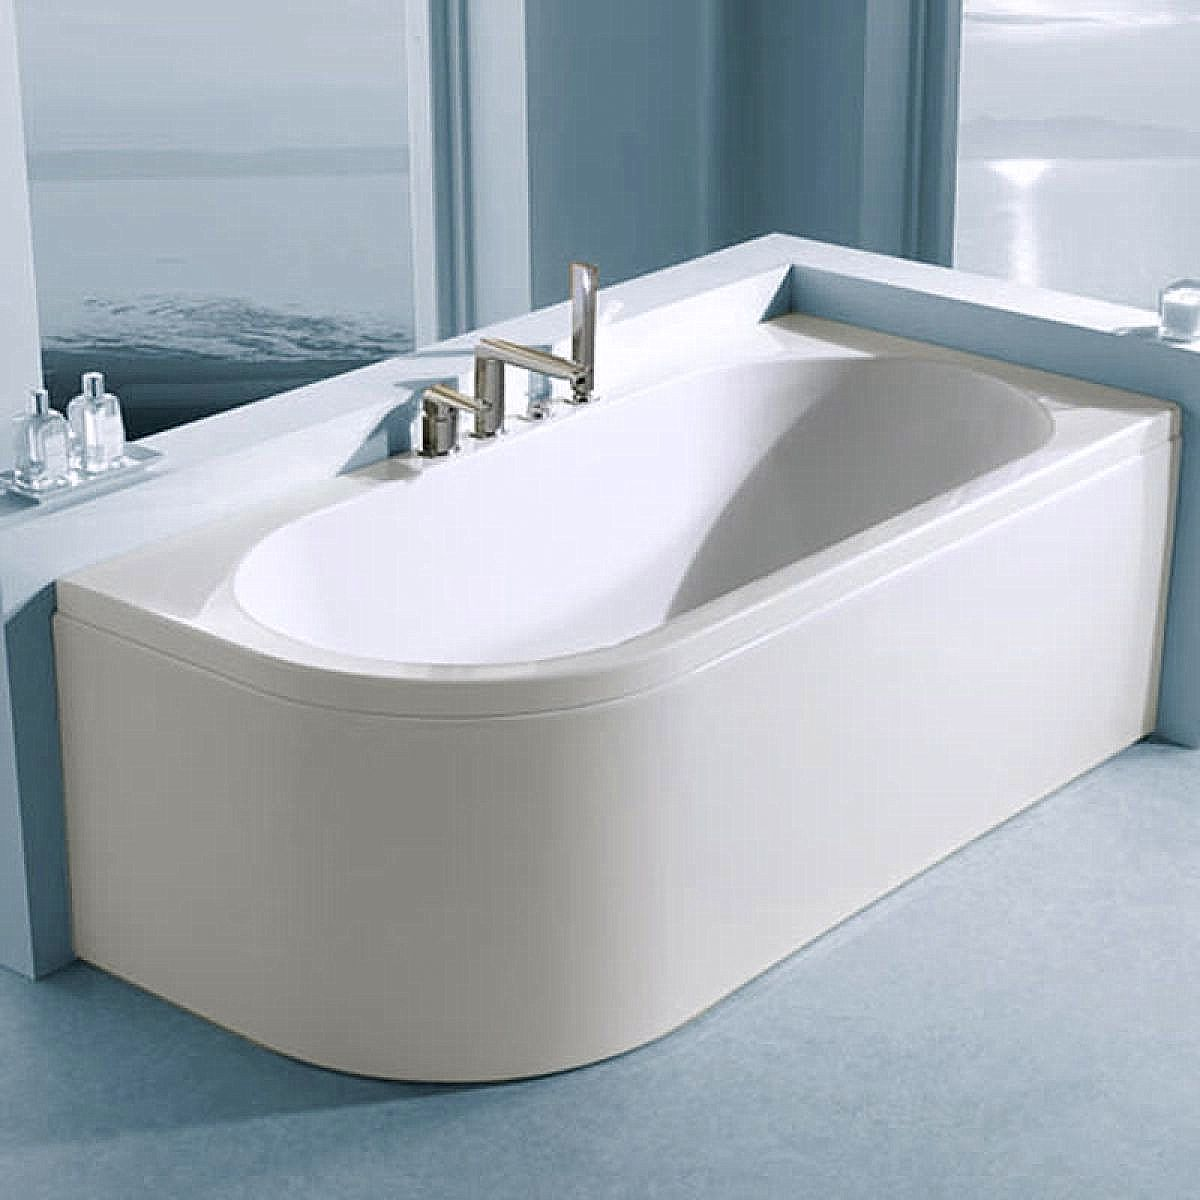 carron status duo offset curved bath uk bathrooms. Black Bedroom Furniture Sets. Home Design Ideas